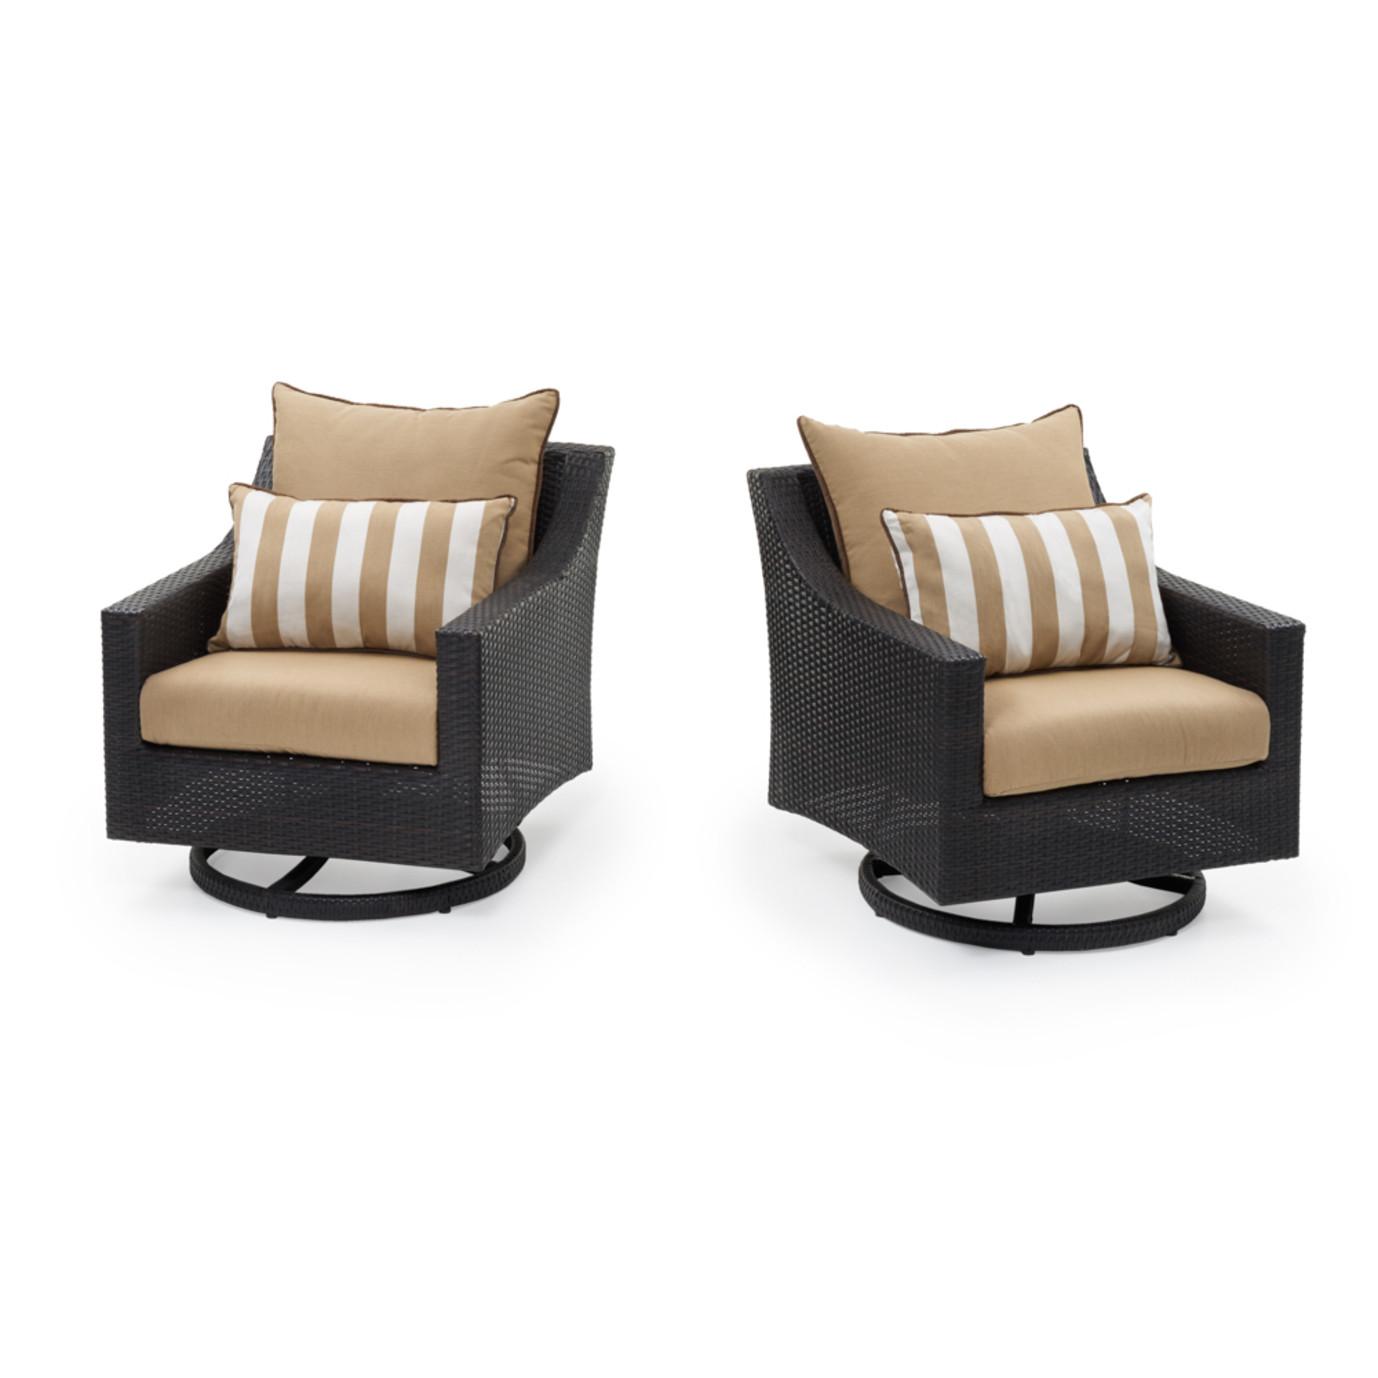 Deco™ Motion Club Chairs - Maxim Beige